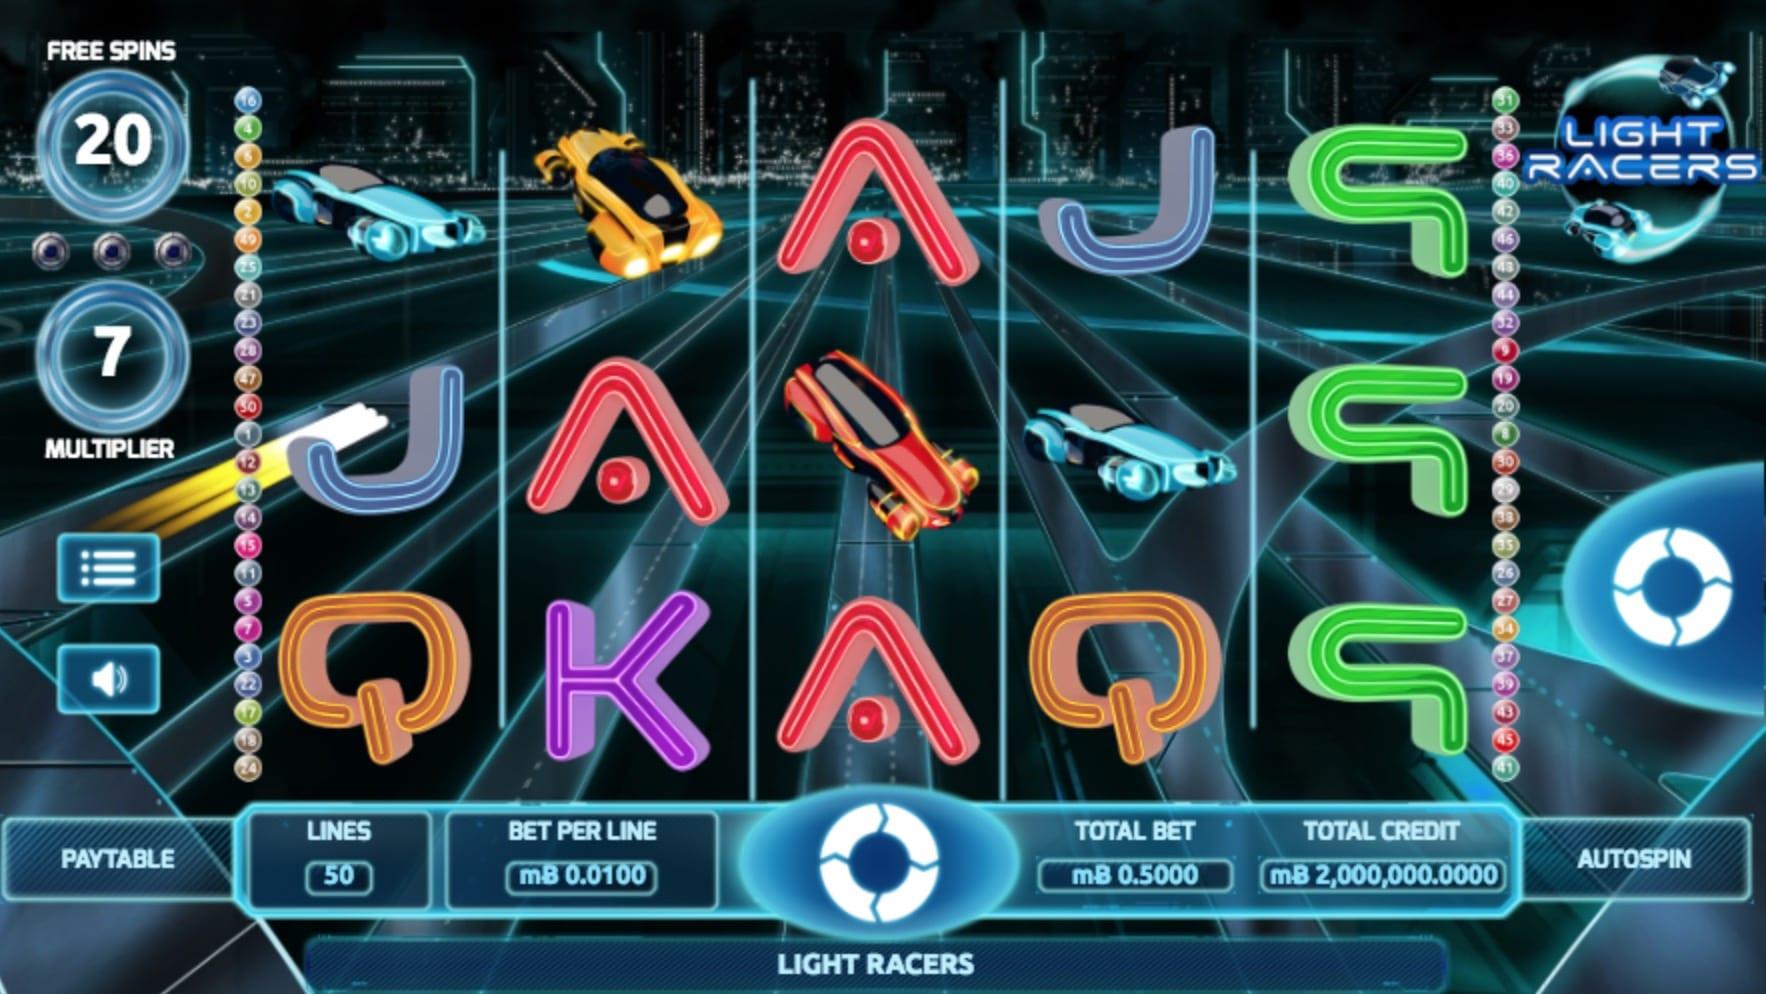 Screenshot of Light Racers gameplay